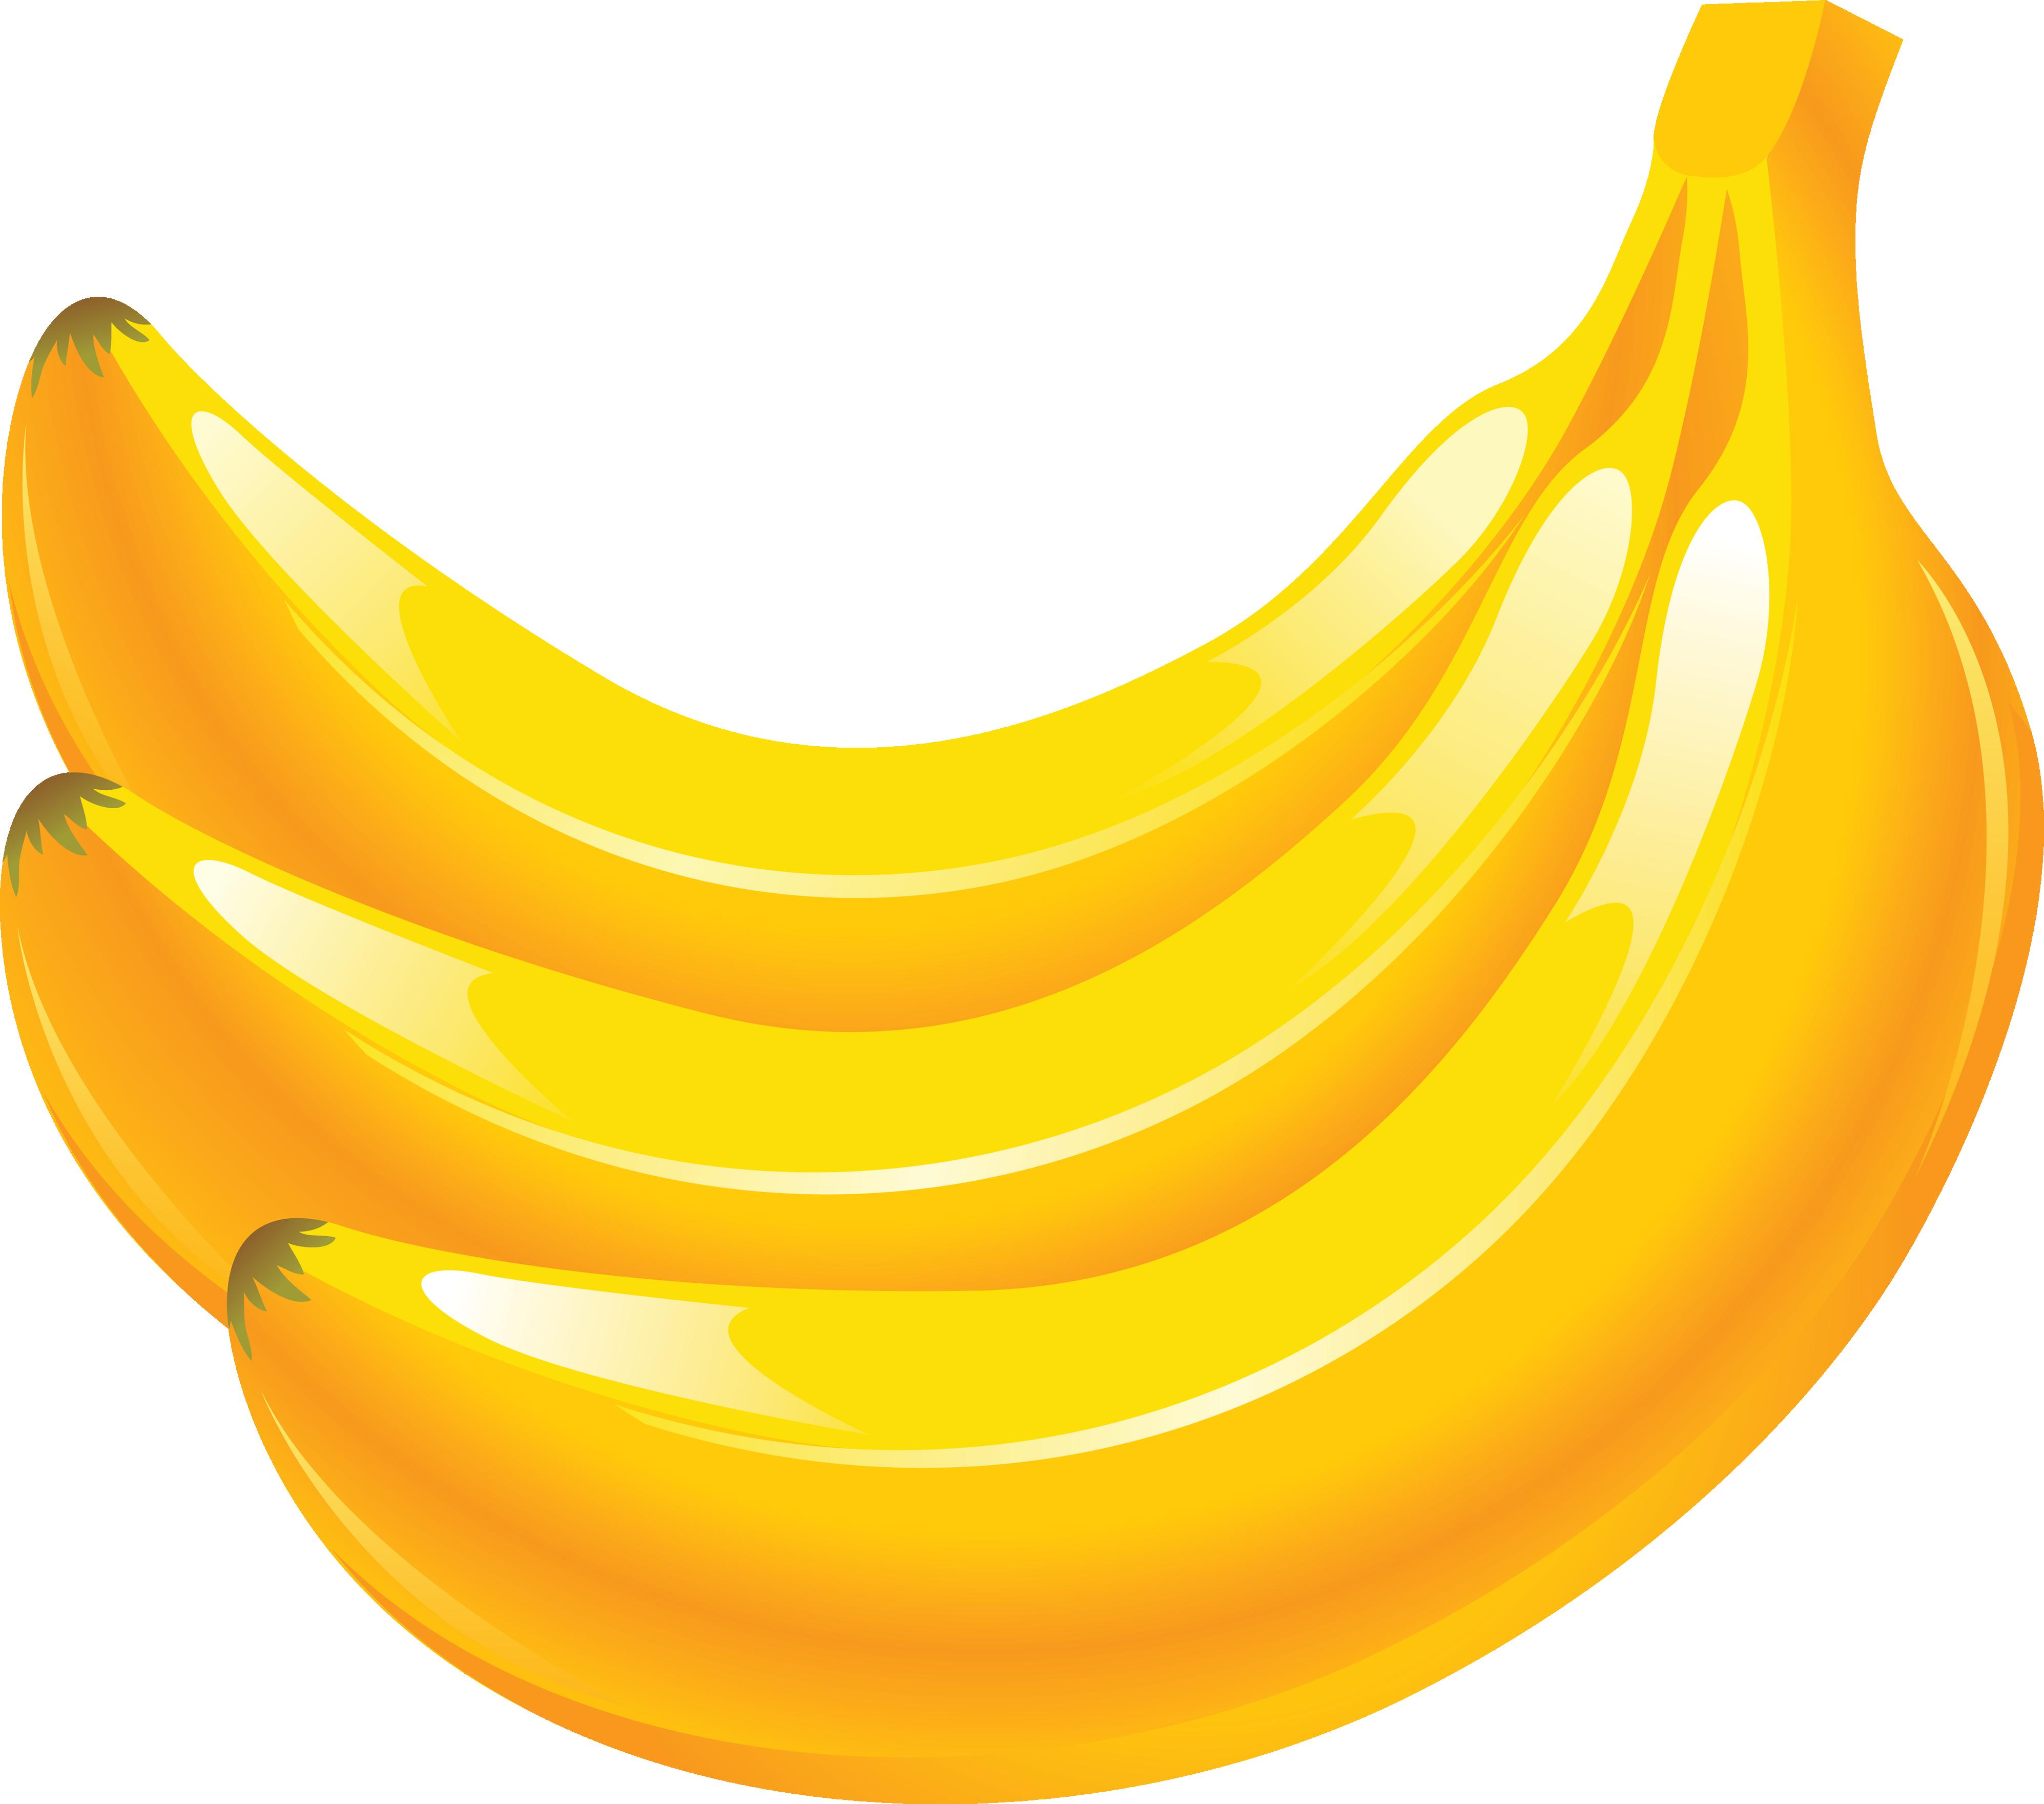 Free Banana Clipart Png, Download Free Clip Art, Free Clip.